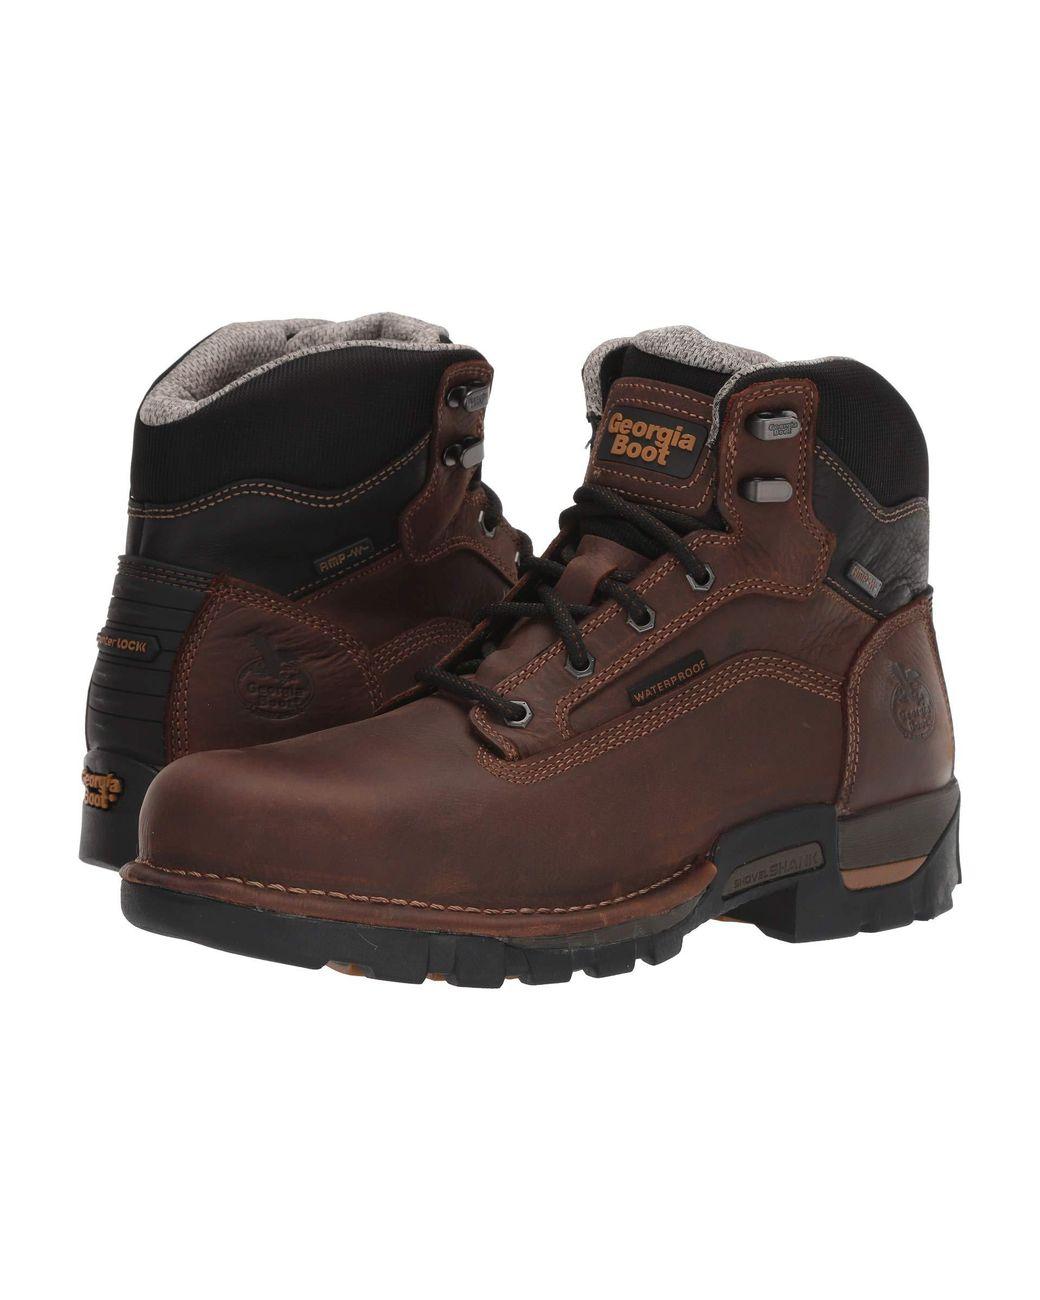 db1210a8675 Men's Brown 6 Eagle One Steel Toe Waterproof